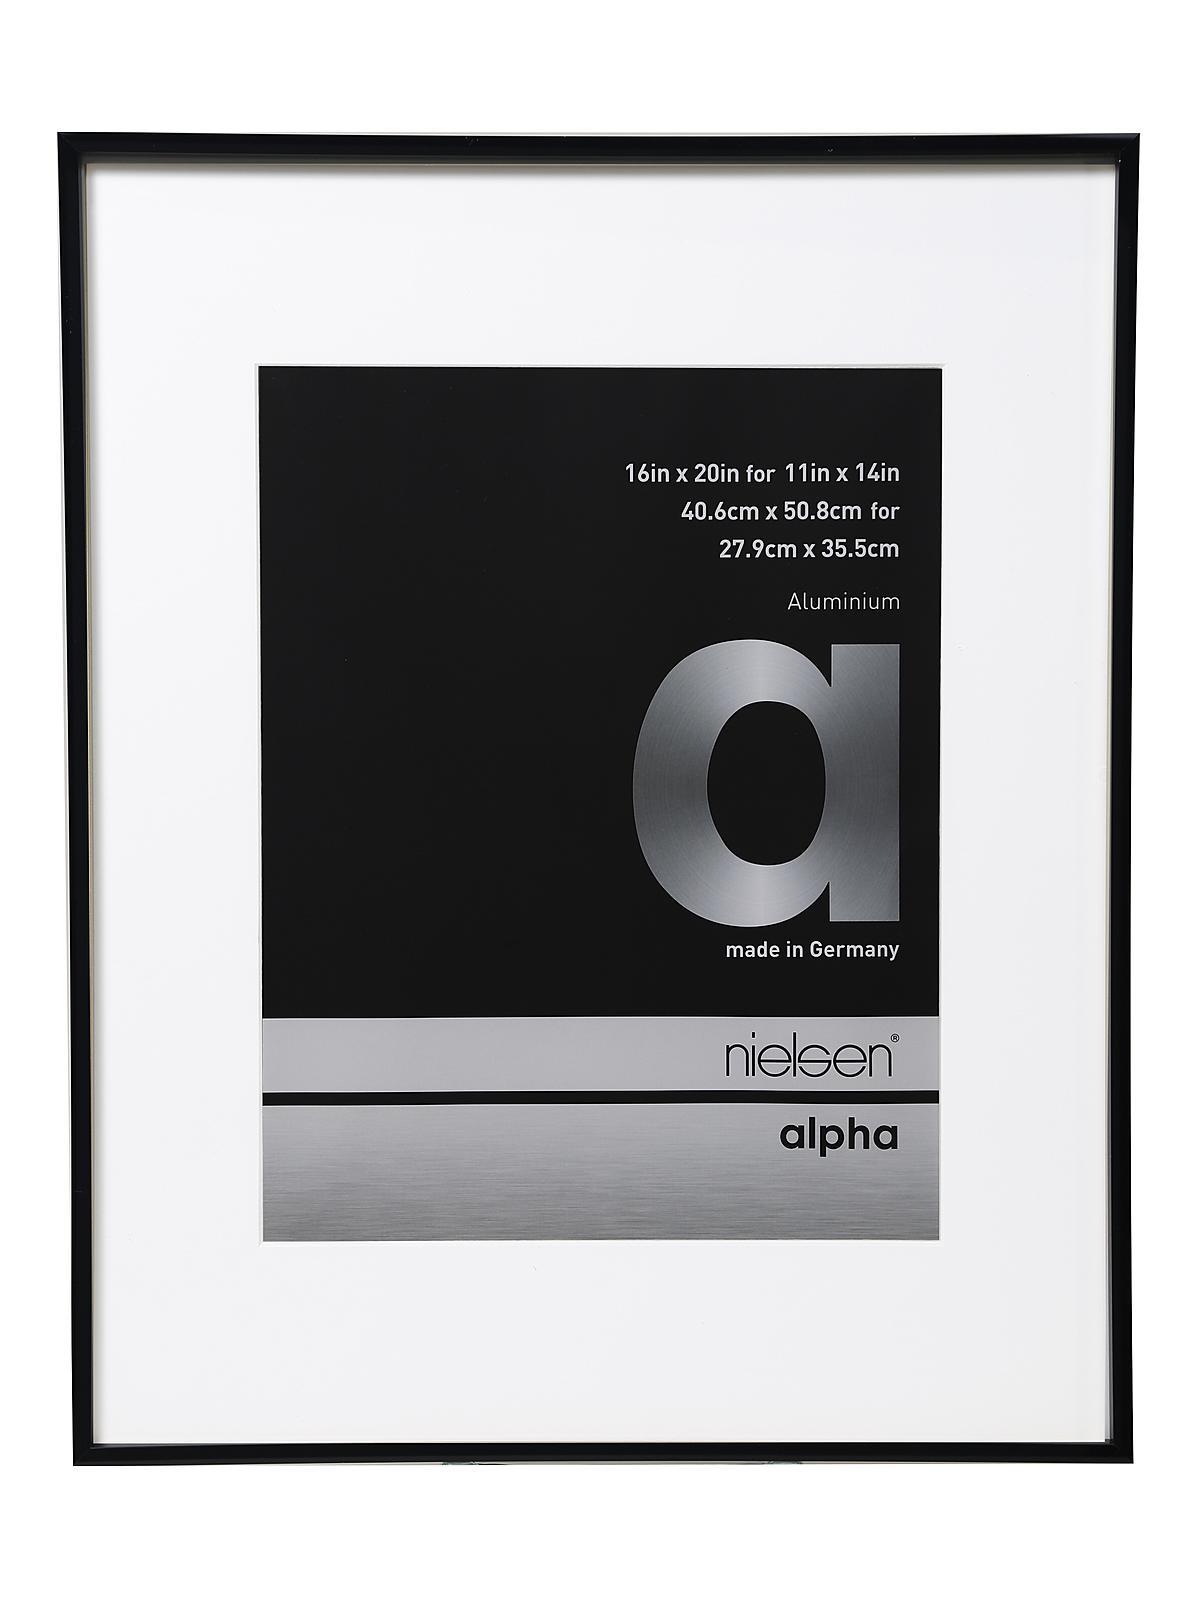 Nielsen Bainbridge Alpha Aluminum Frames